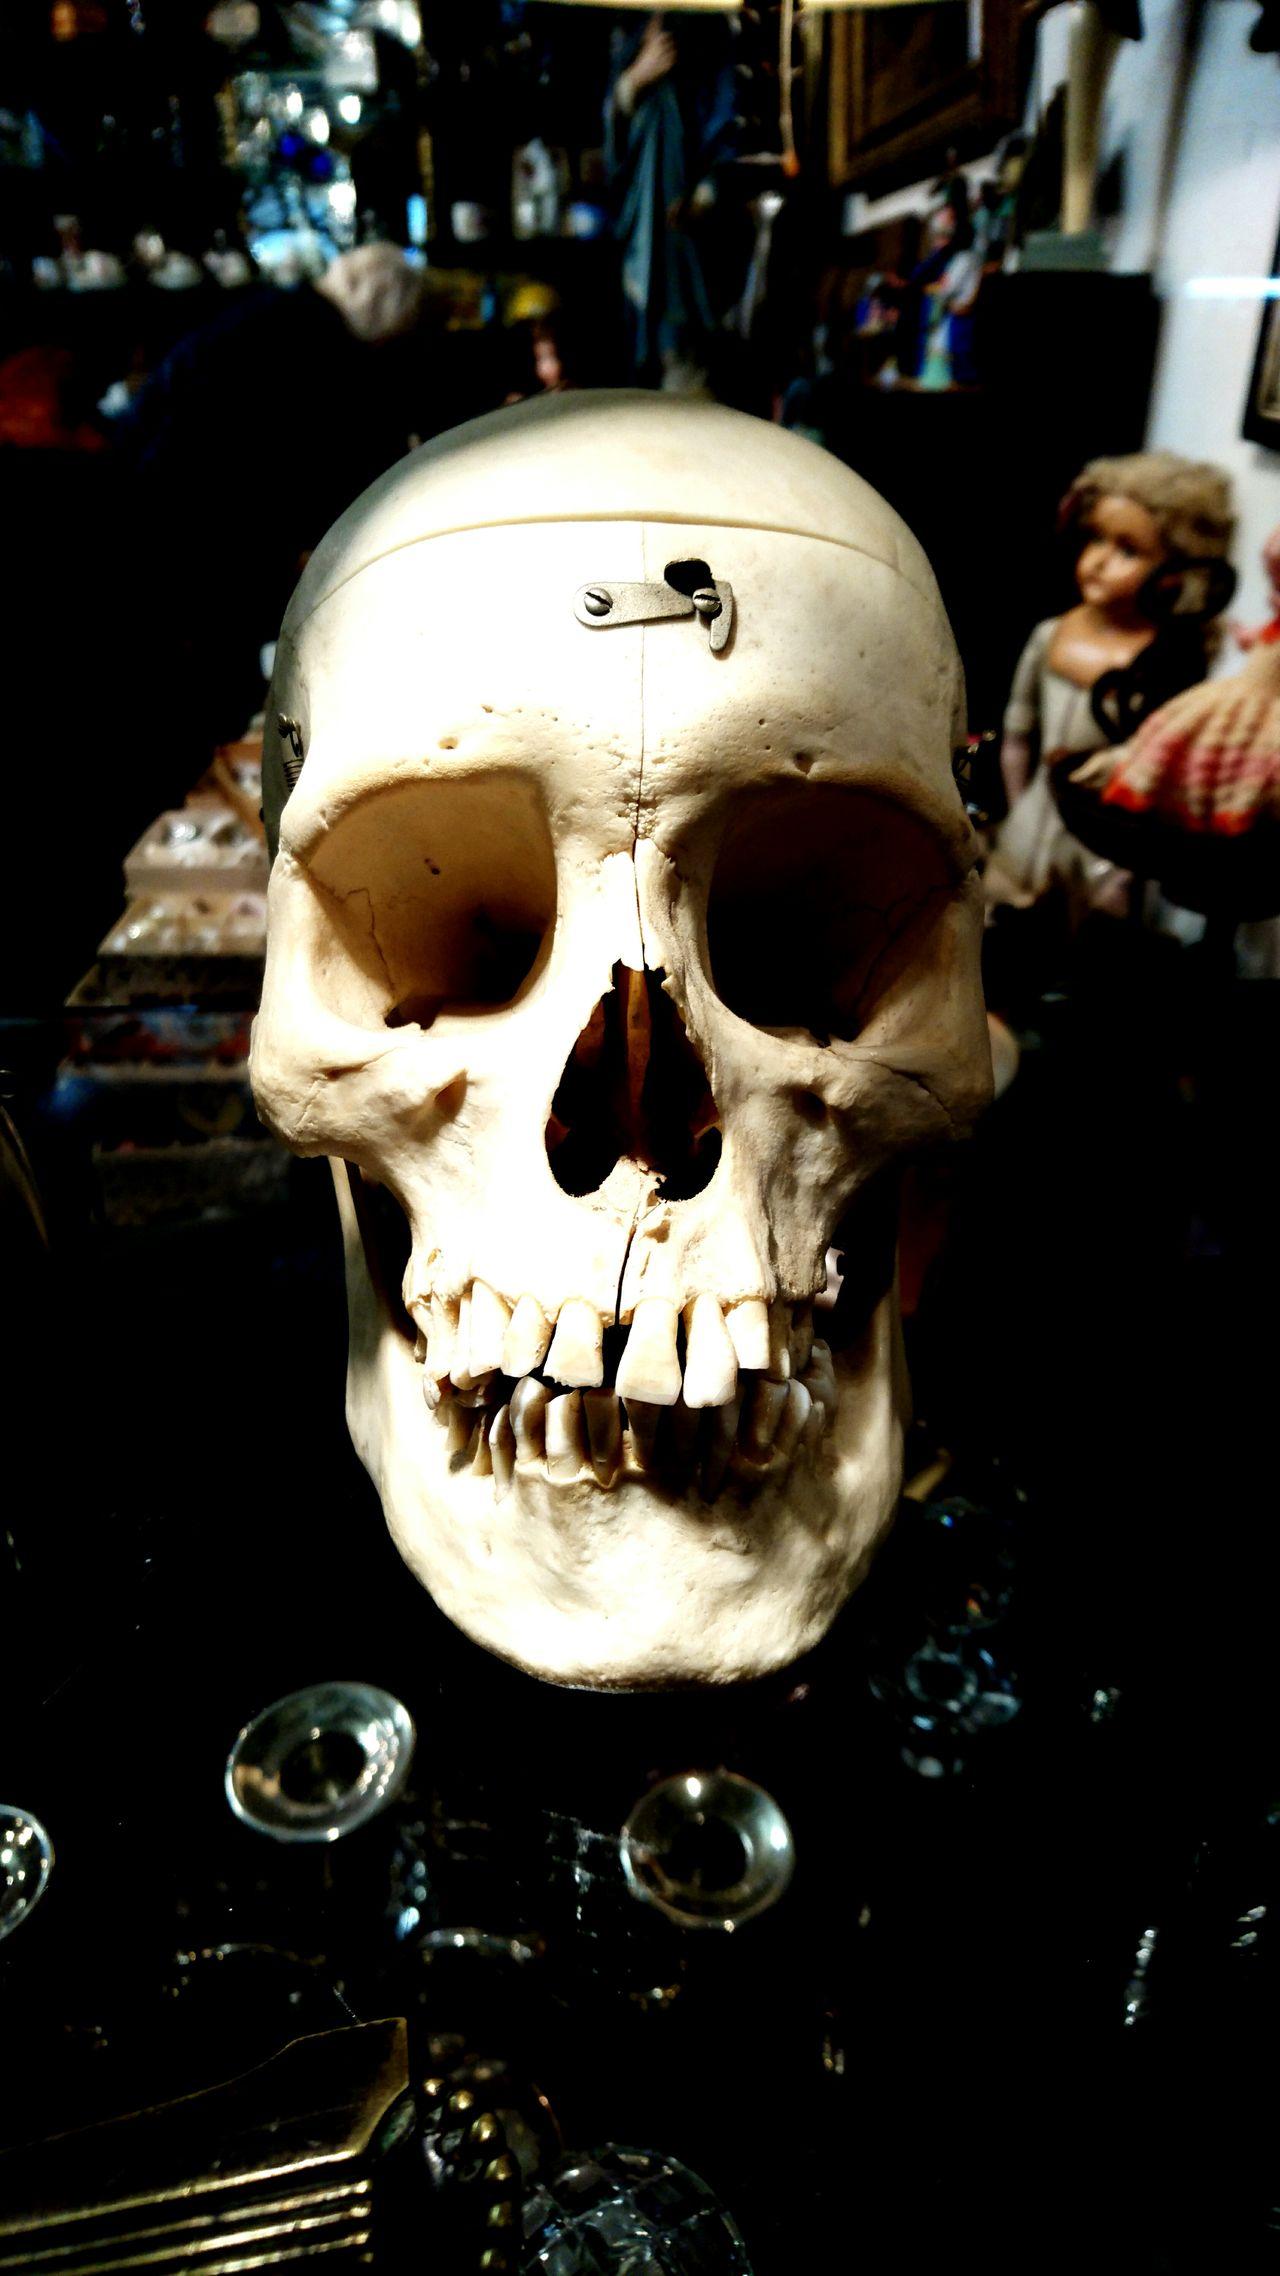 Fleemarket Close-up Human Body Part Human Skeleton Anthropomorphic Face Human Skull People Outdoors Talking Pictures Taking Photos Taking Pictures